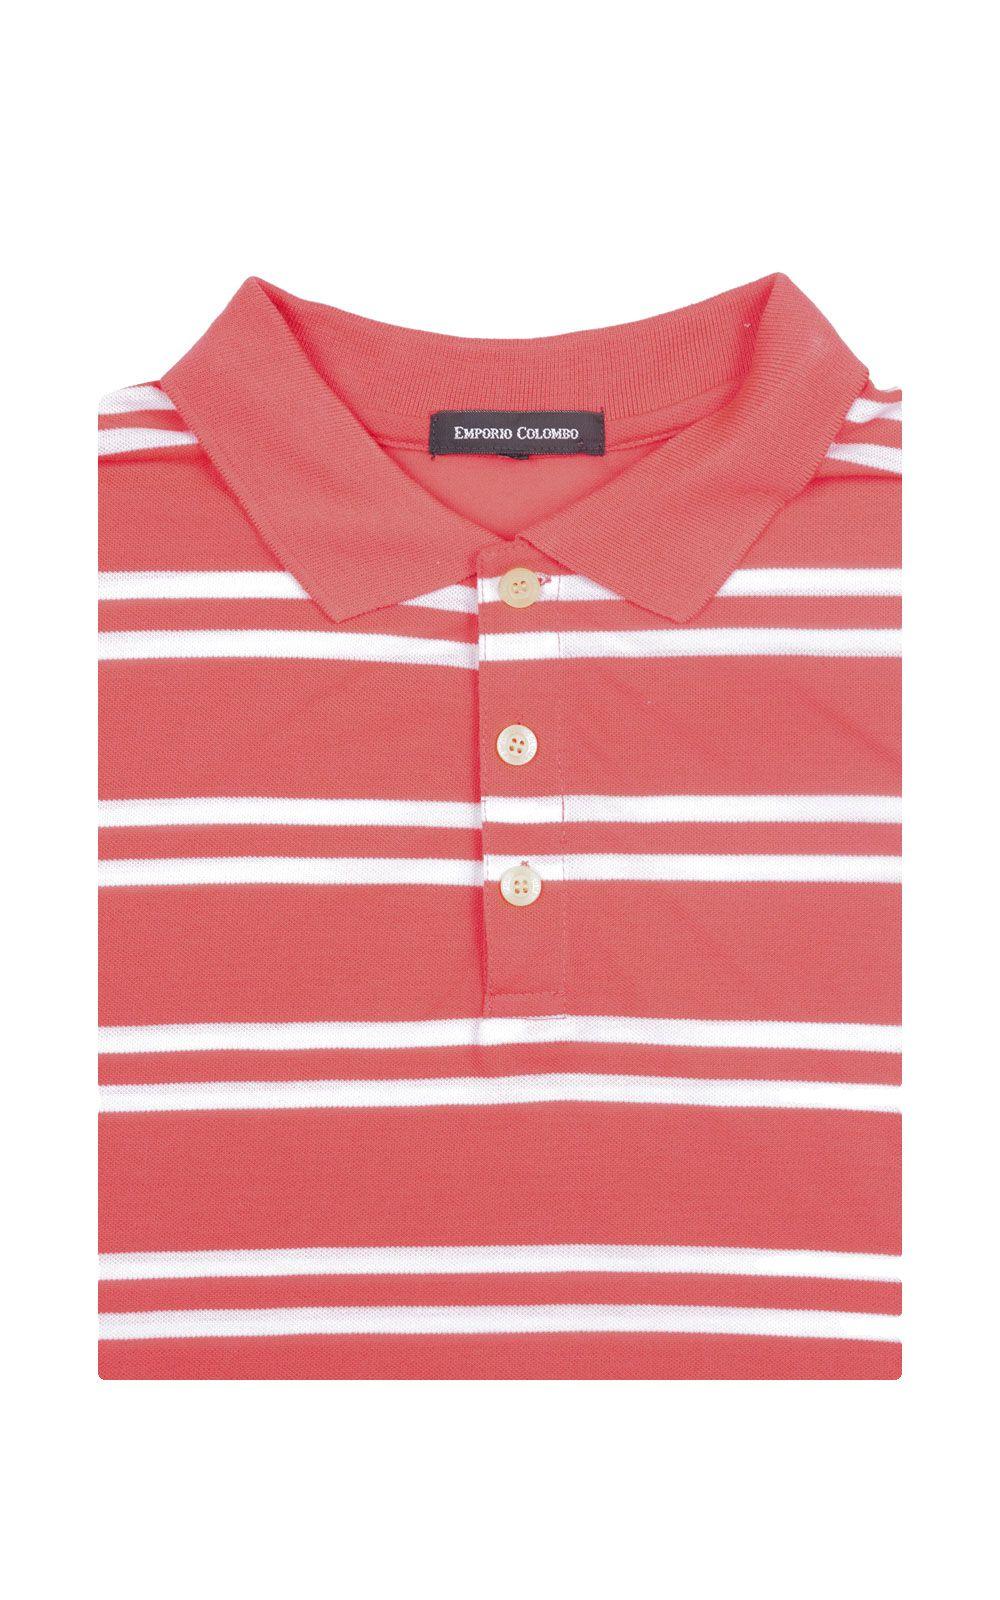 Foto 4 - Camisa Polo Masculina Rosa Listrada